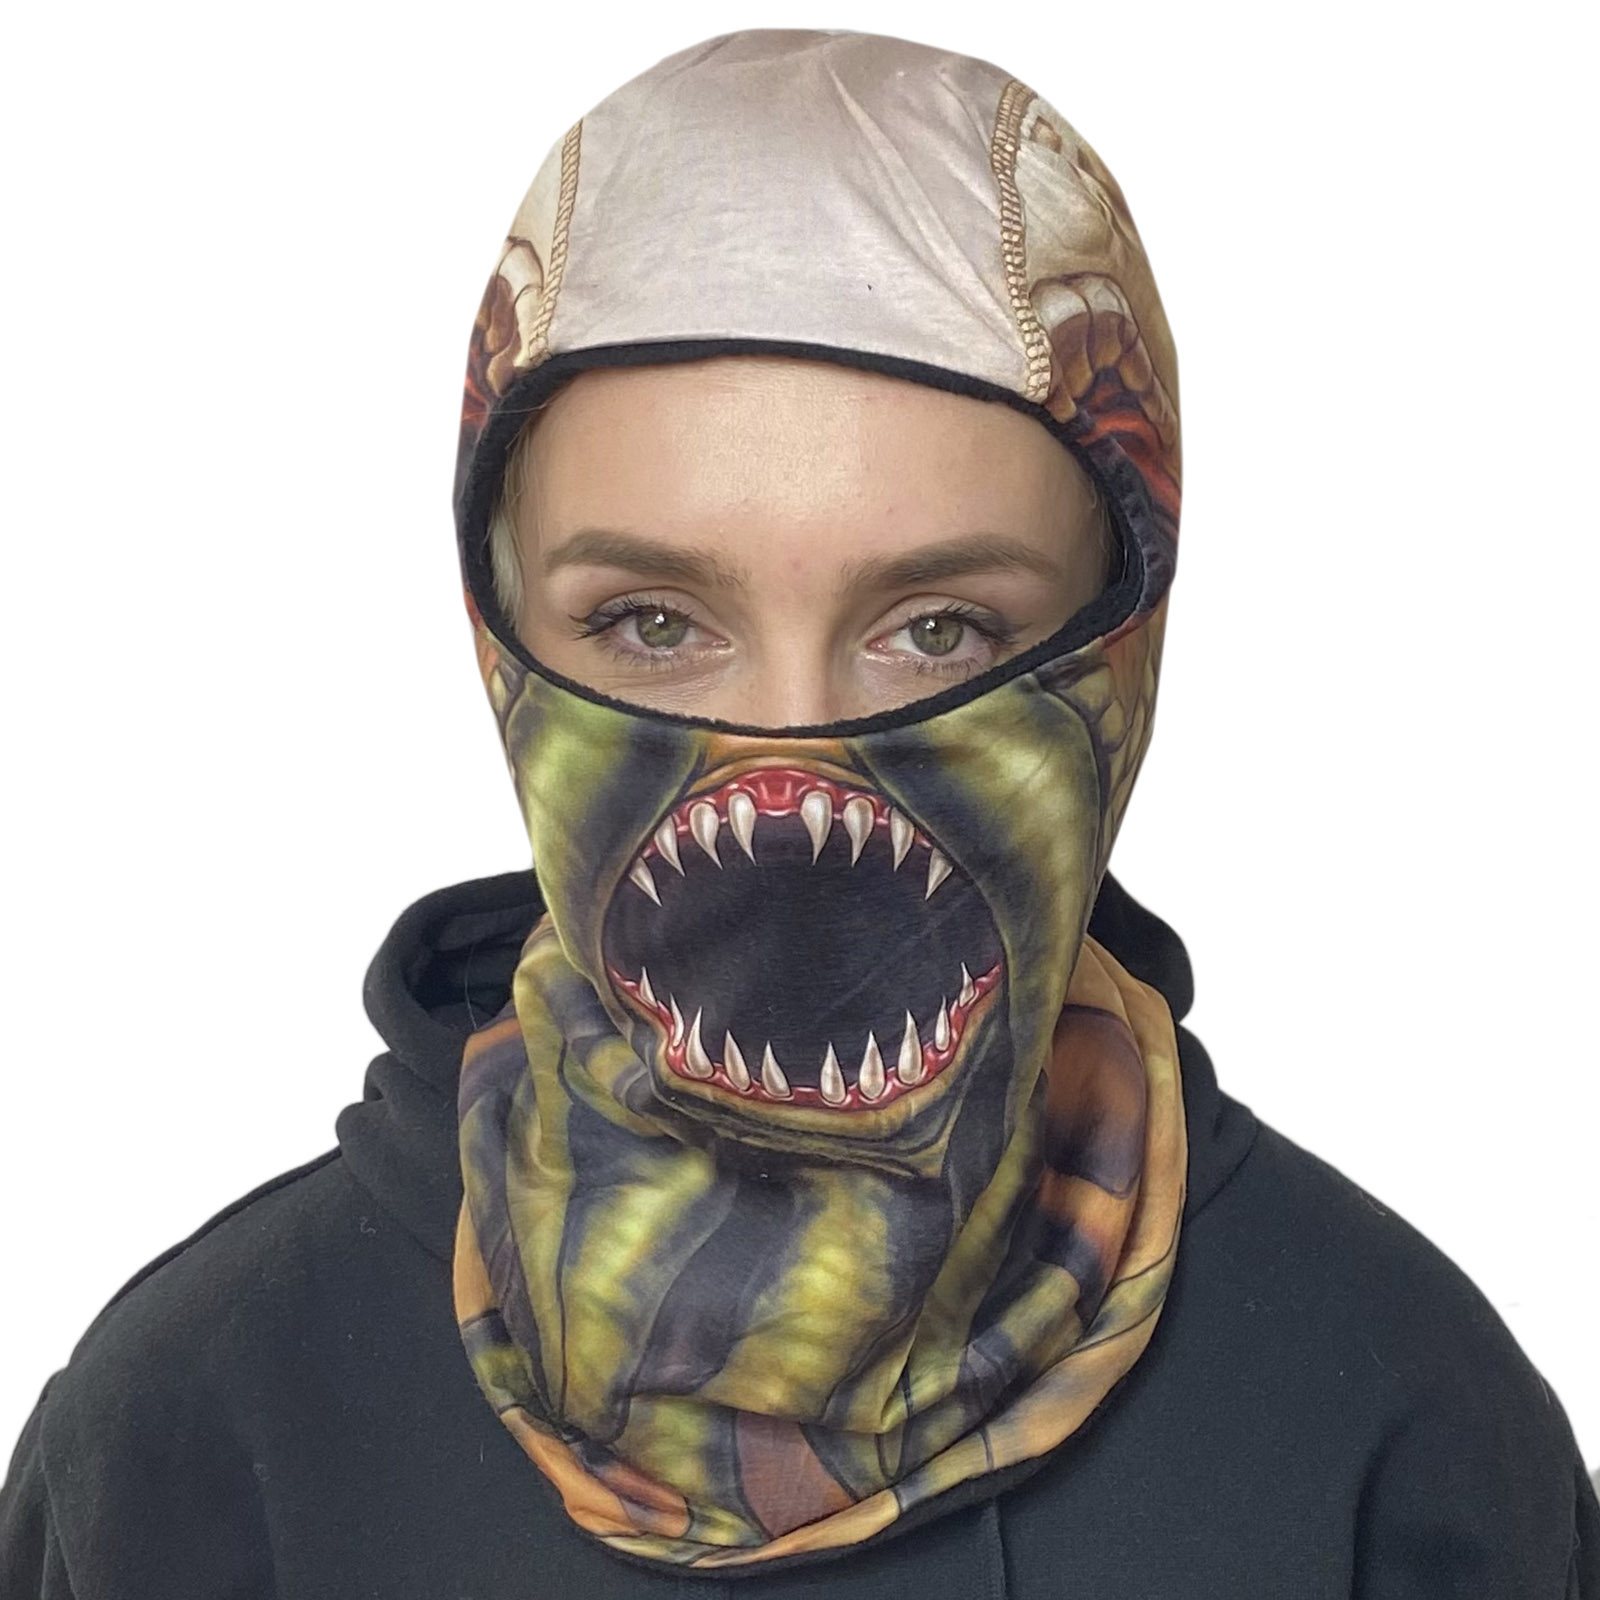 Байкерская балаклава Wild Wear Cthulhu с защитой от коронавируса